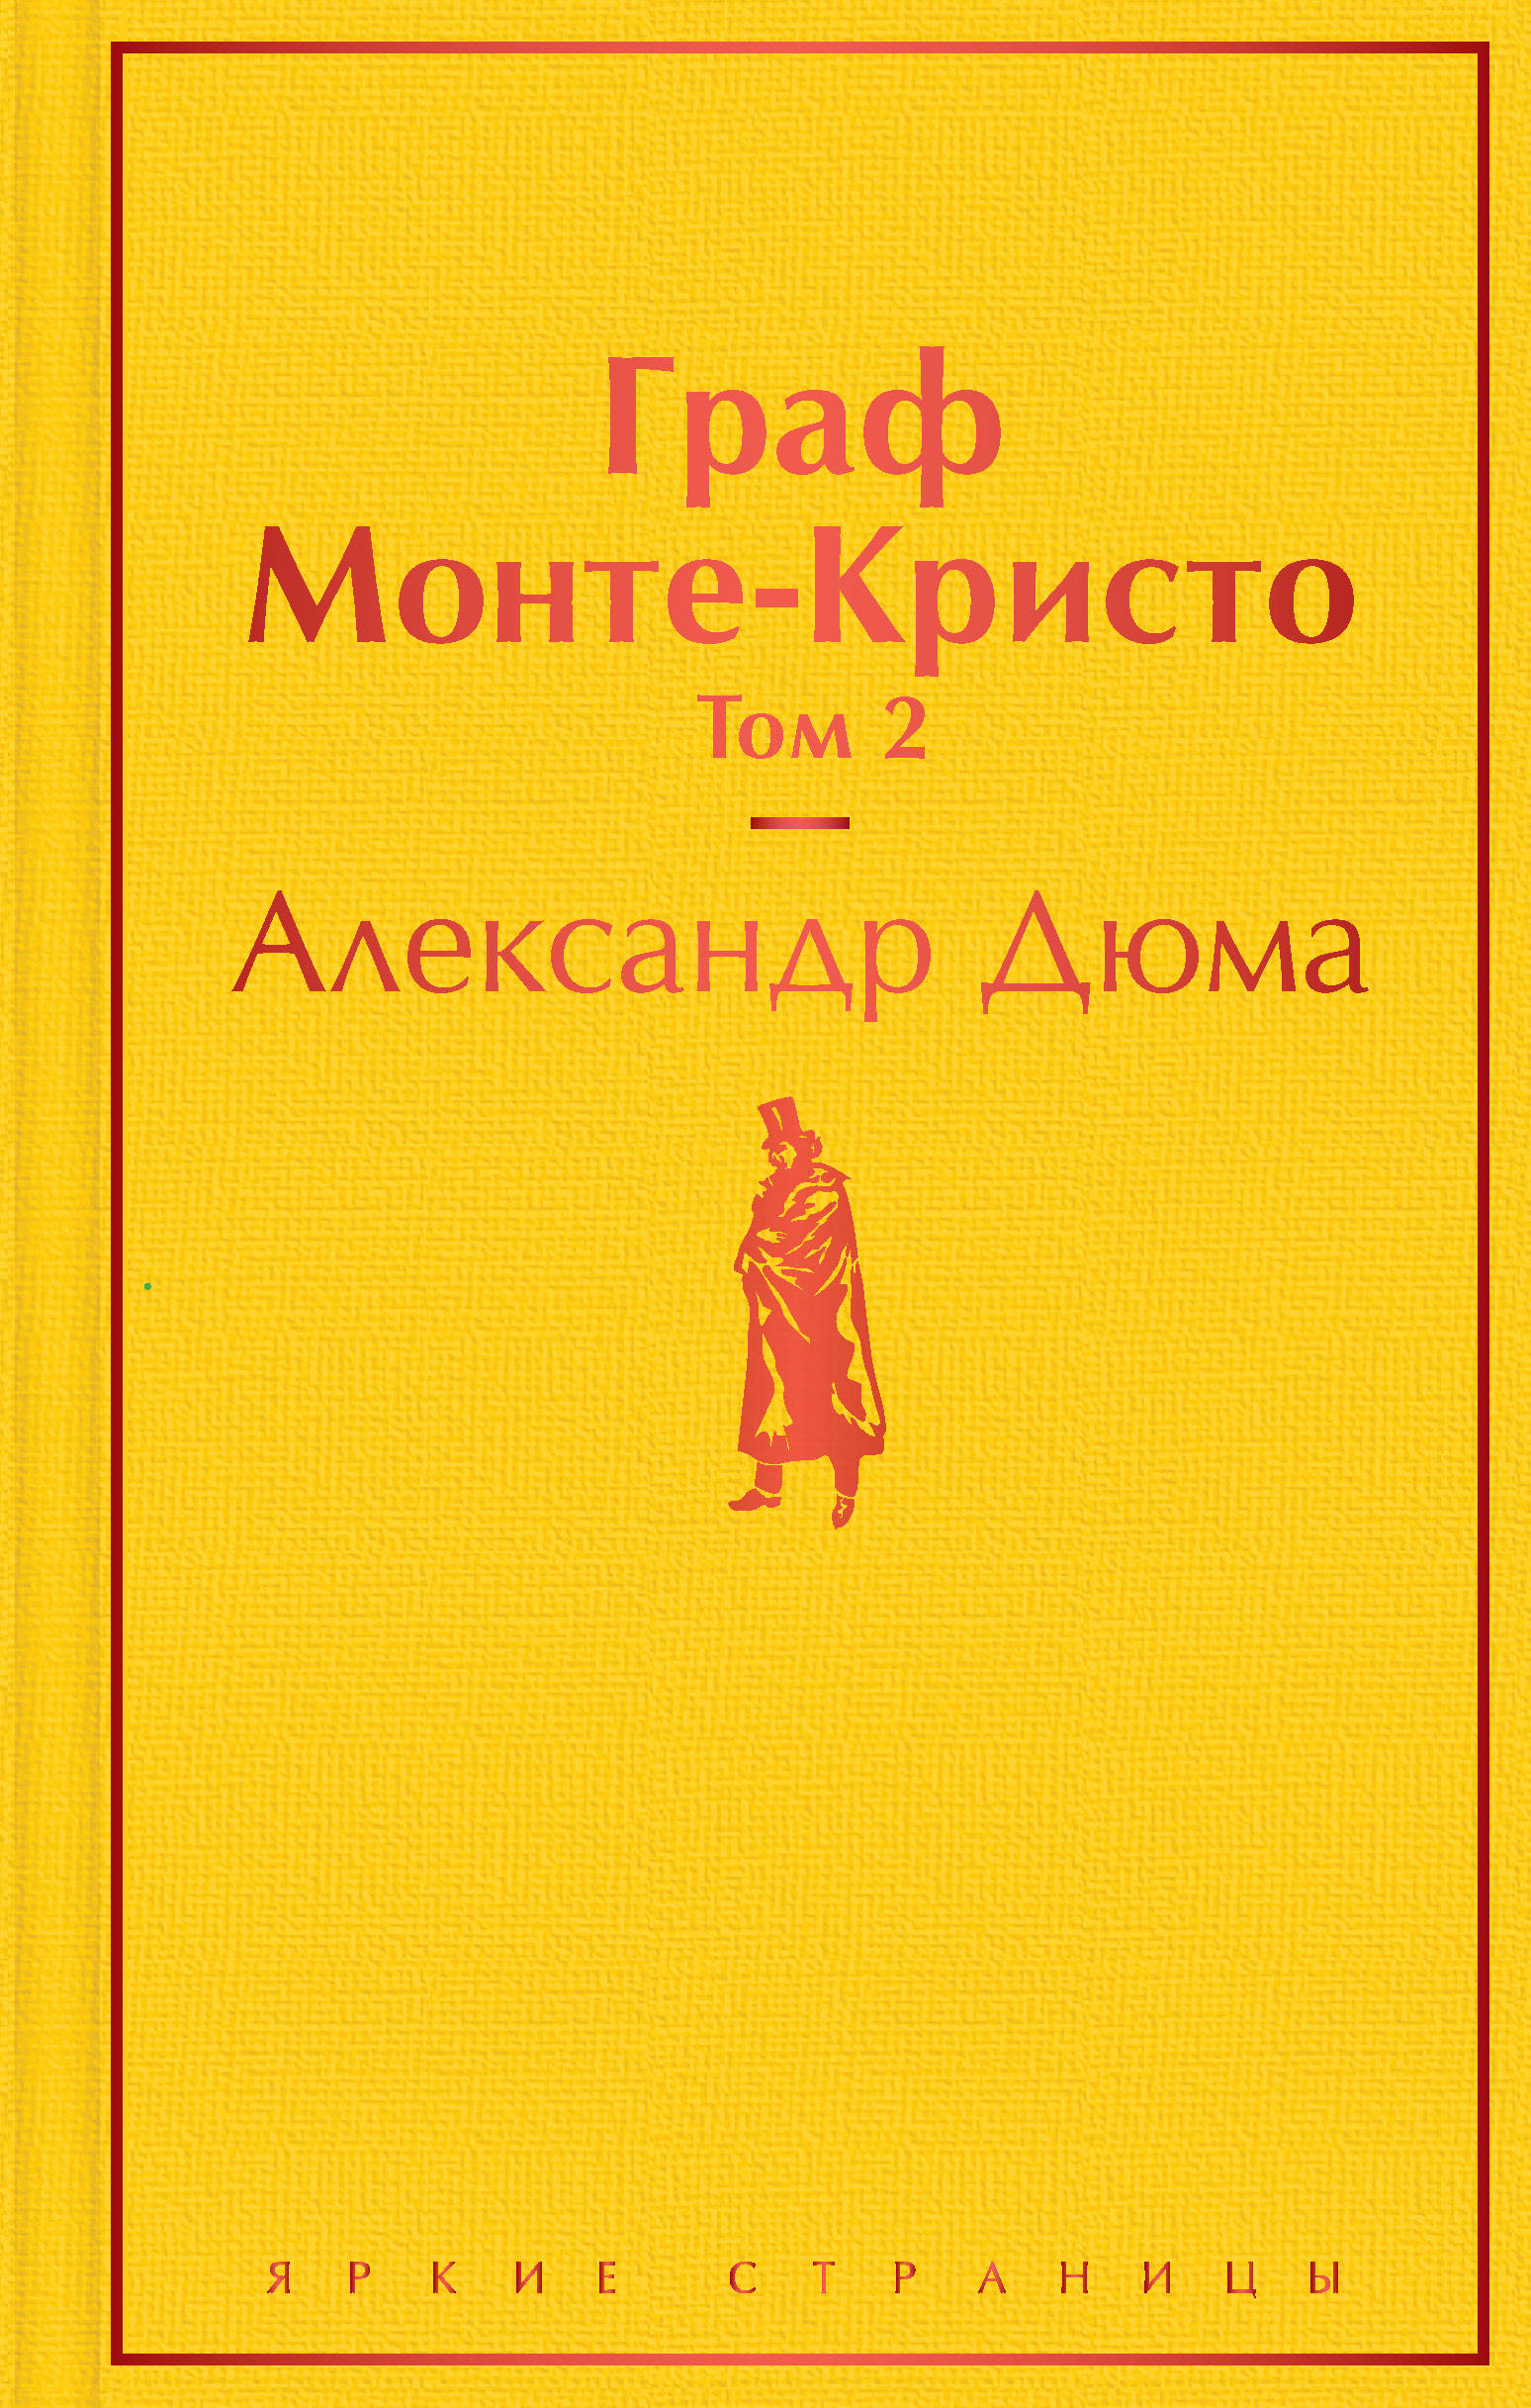 Граф Монте-Кристо. Том 2: Роман